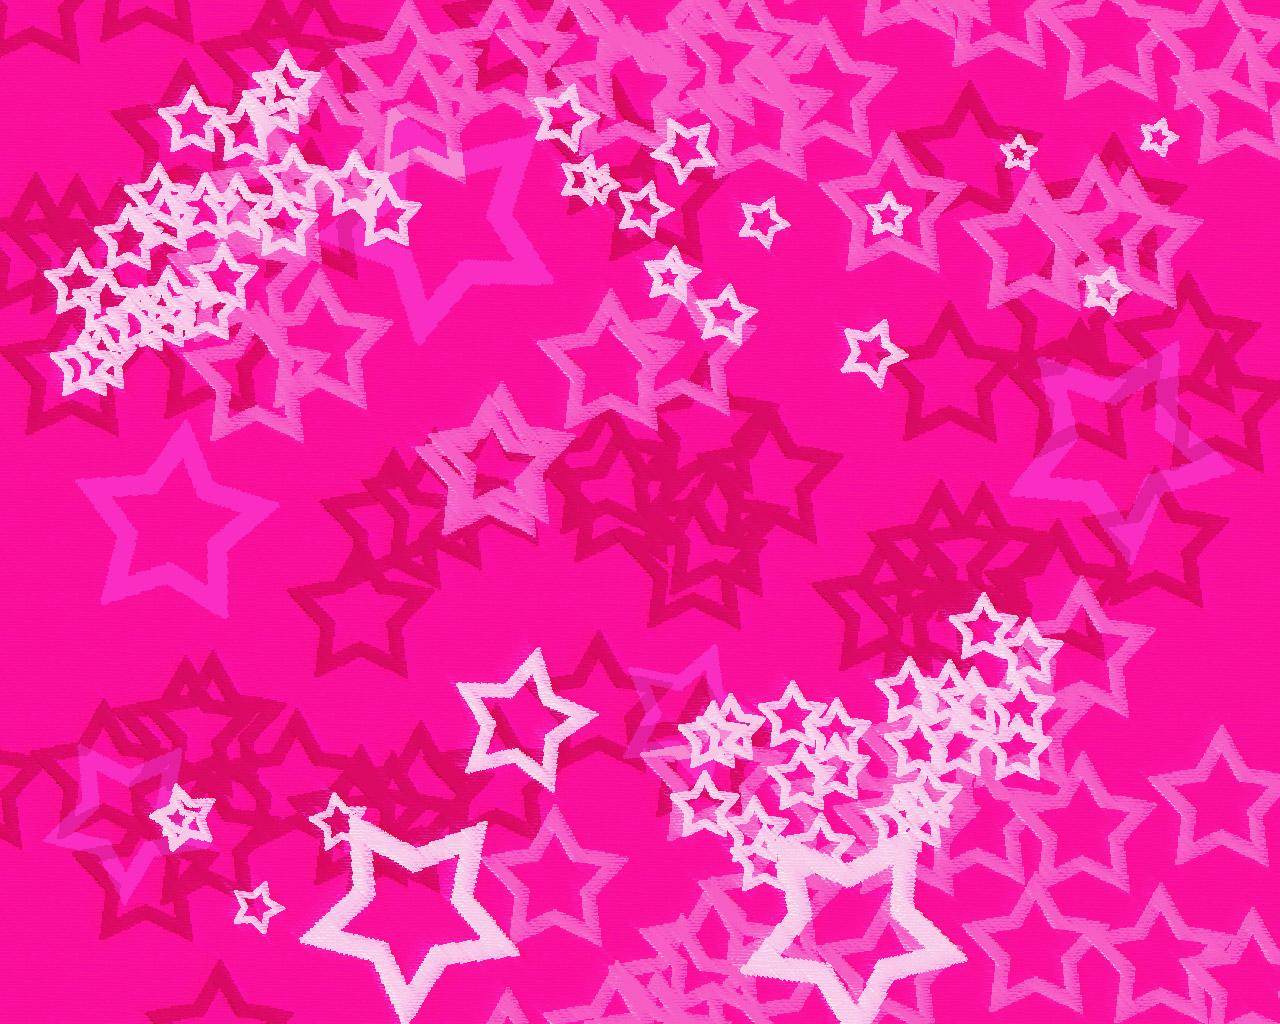 http://4.bp.blogspot.com/-JDYaYHqgaaA/TkrTNcXDOAI/AAAAAAAADbQ/Tmn1elOxnu4/s1600/Pink+wallpaper+desktop+1.jpg